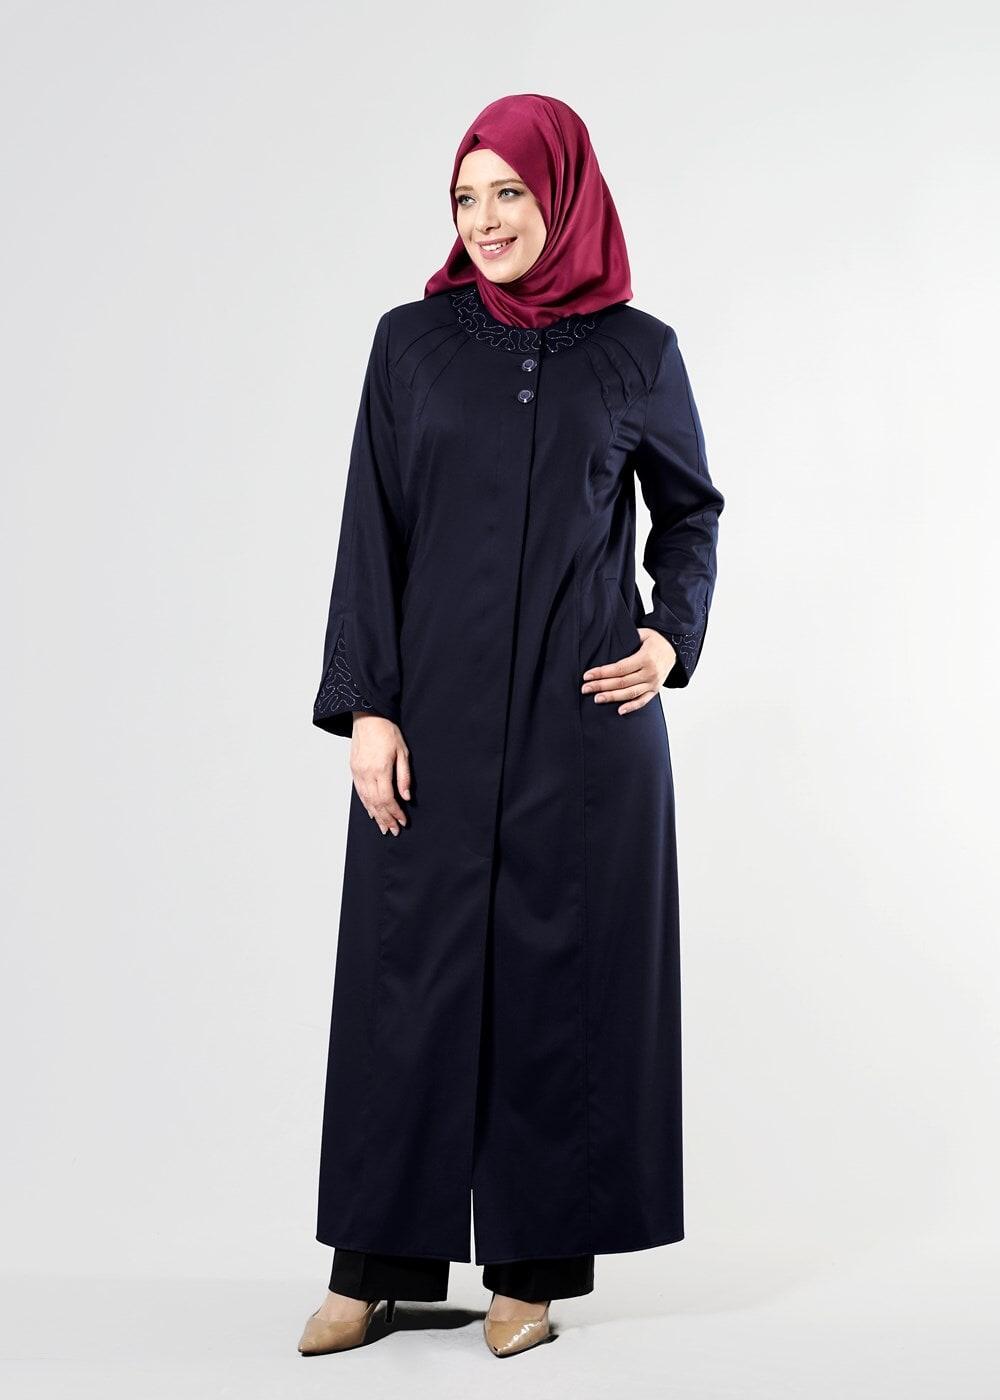 Femelle BLEU MARINE T 1535 İnessa Tesettür Pardesü-Alv Fashion